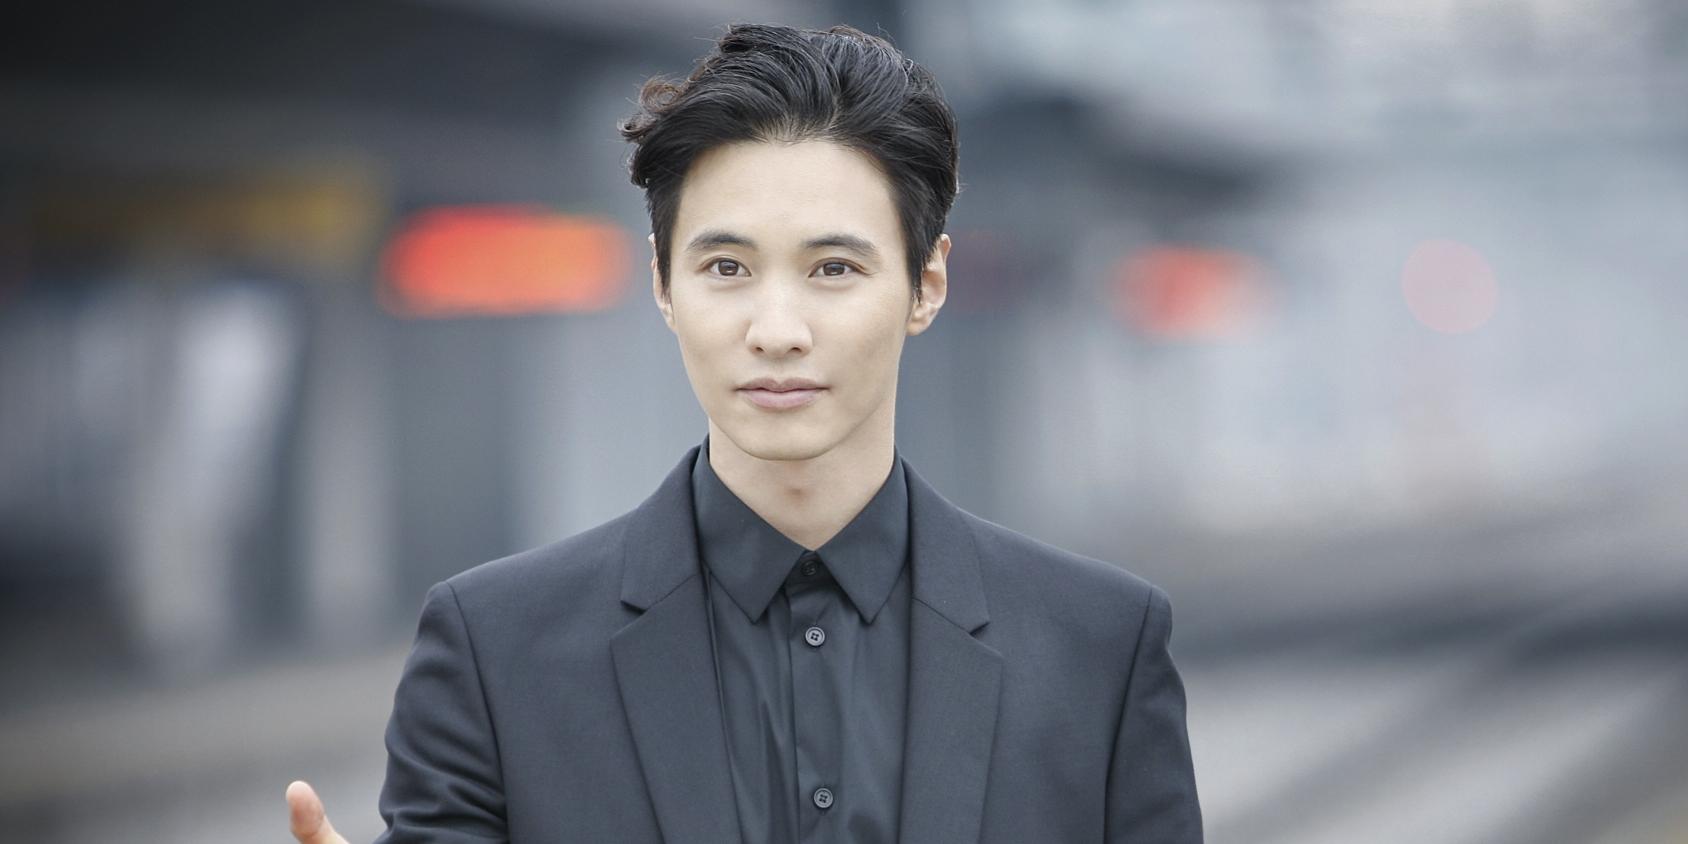 kemunculan-perdana-won-bin-setelah-kela-bab7ee